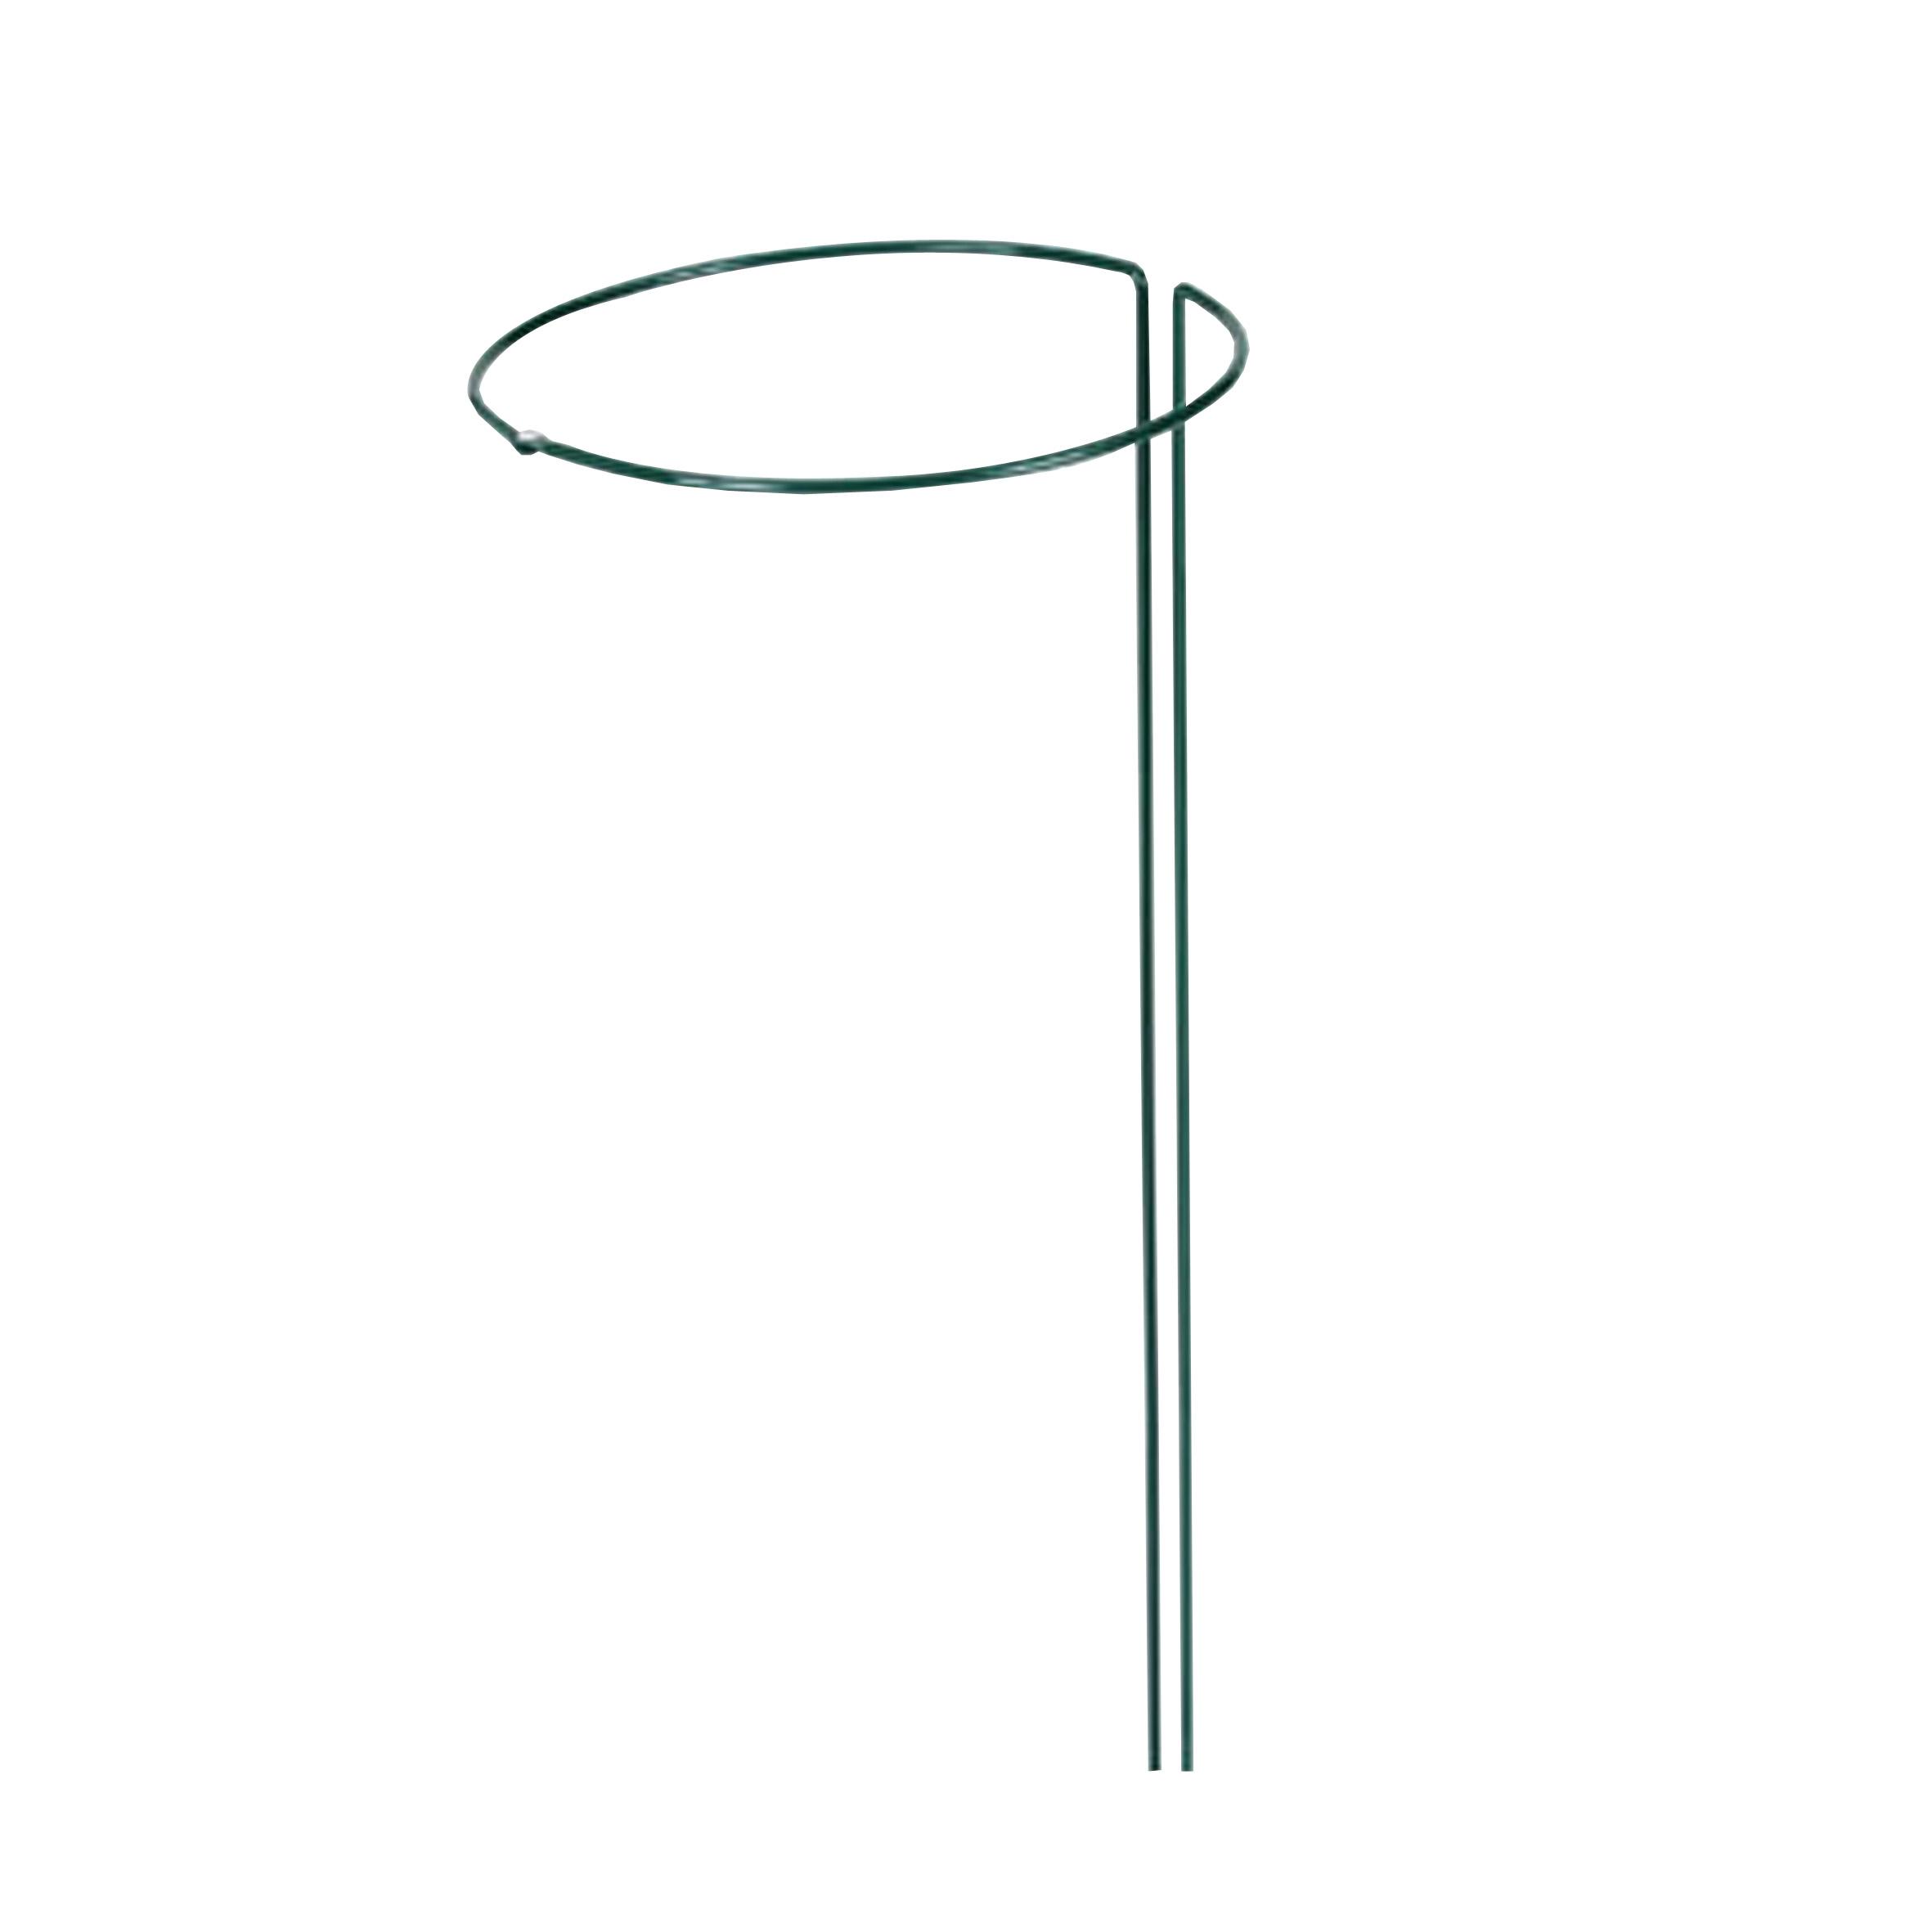 5 Stück Pflanzenstütze grün Pflanzstütze kunststoffbeschichtet Ø 30 x 100 cm neu